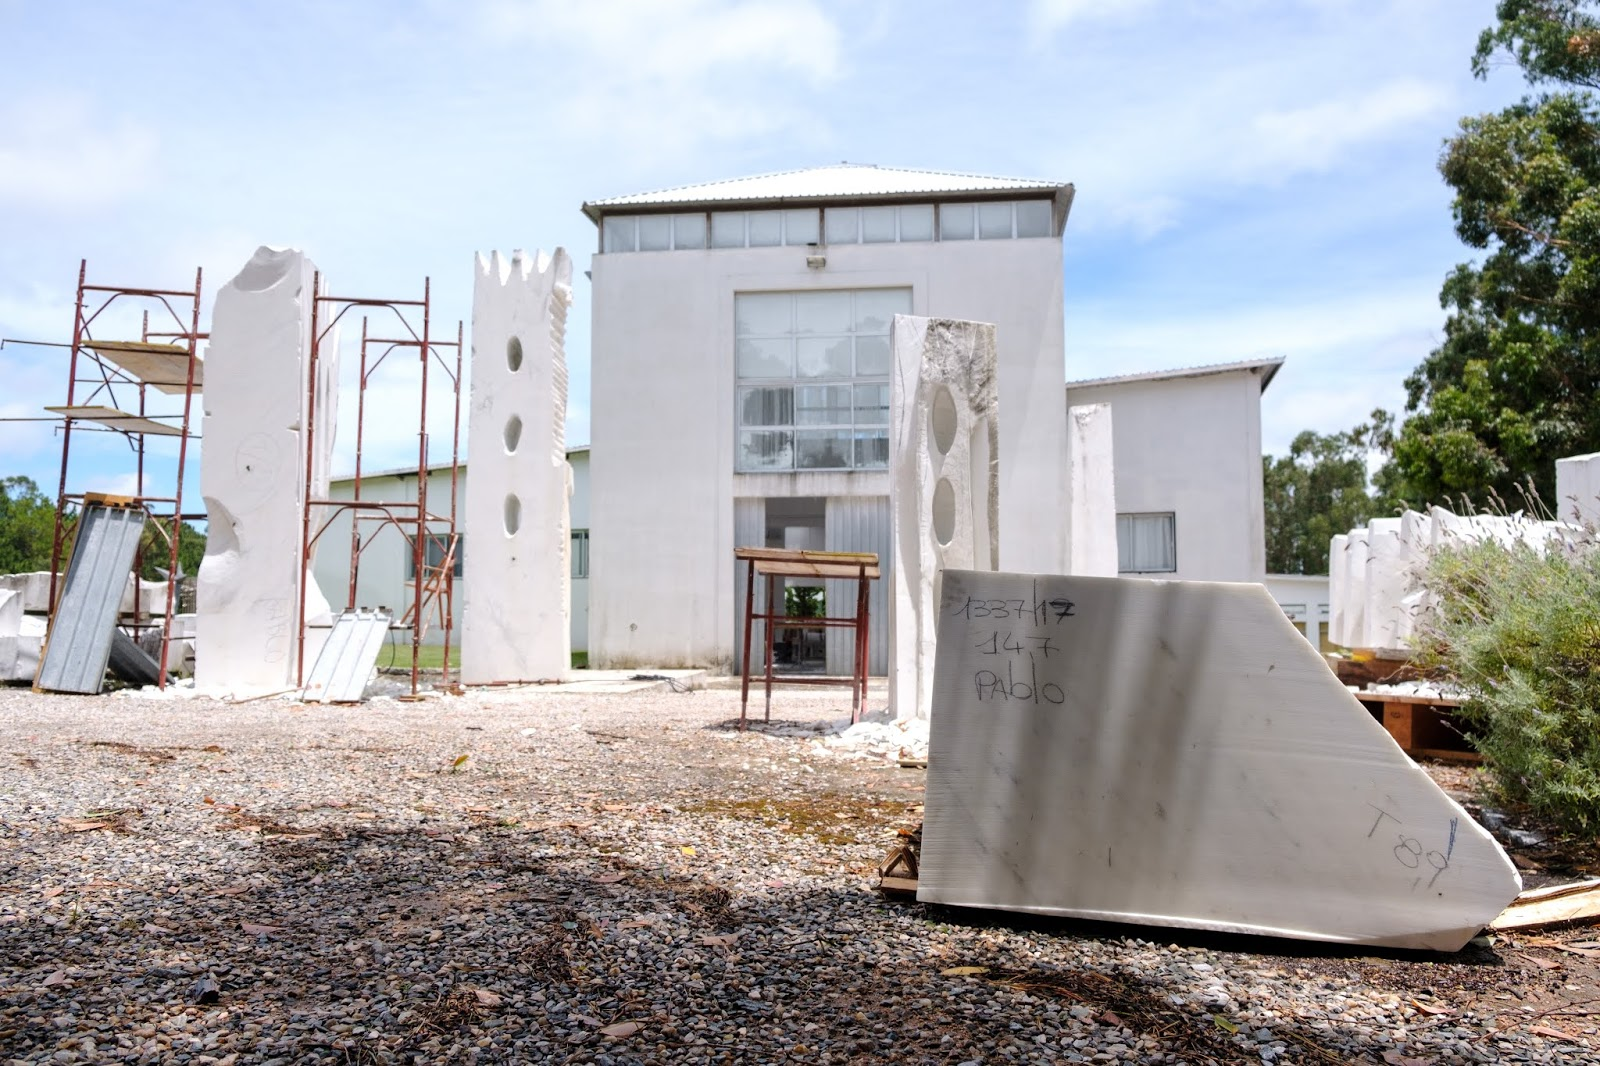 Visita Fundacao Pablo Atchugarry em Punta del Leste